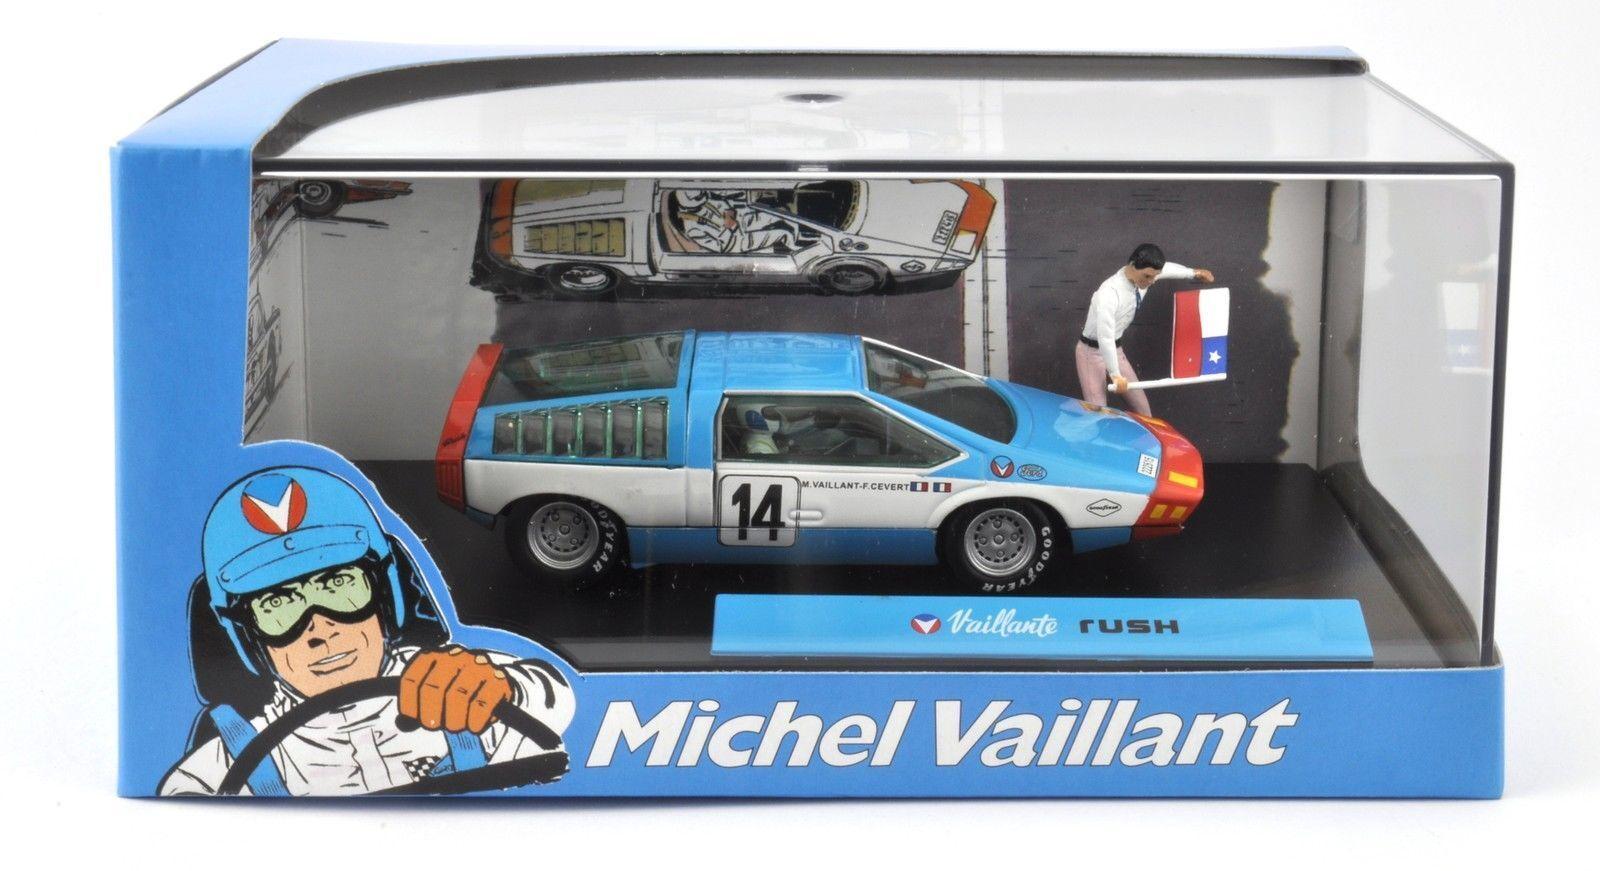 Michel Vaillant Le Mans RUSH - 1 43 IXO ALTAYA VOITURE DIECAST MODEL V16